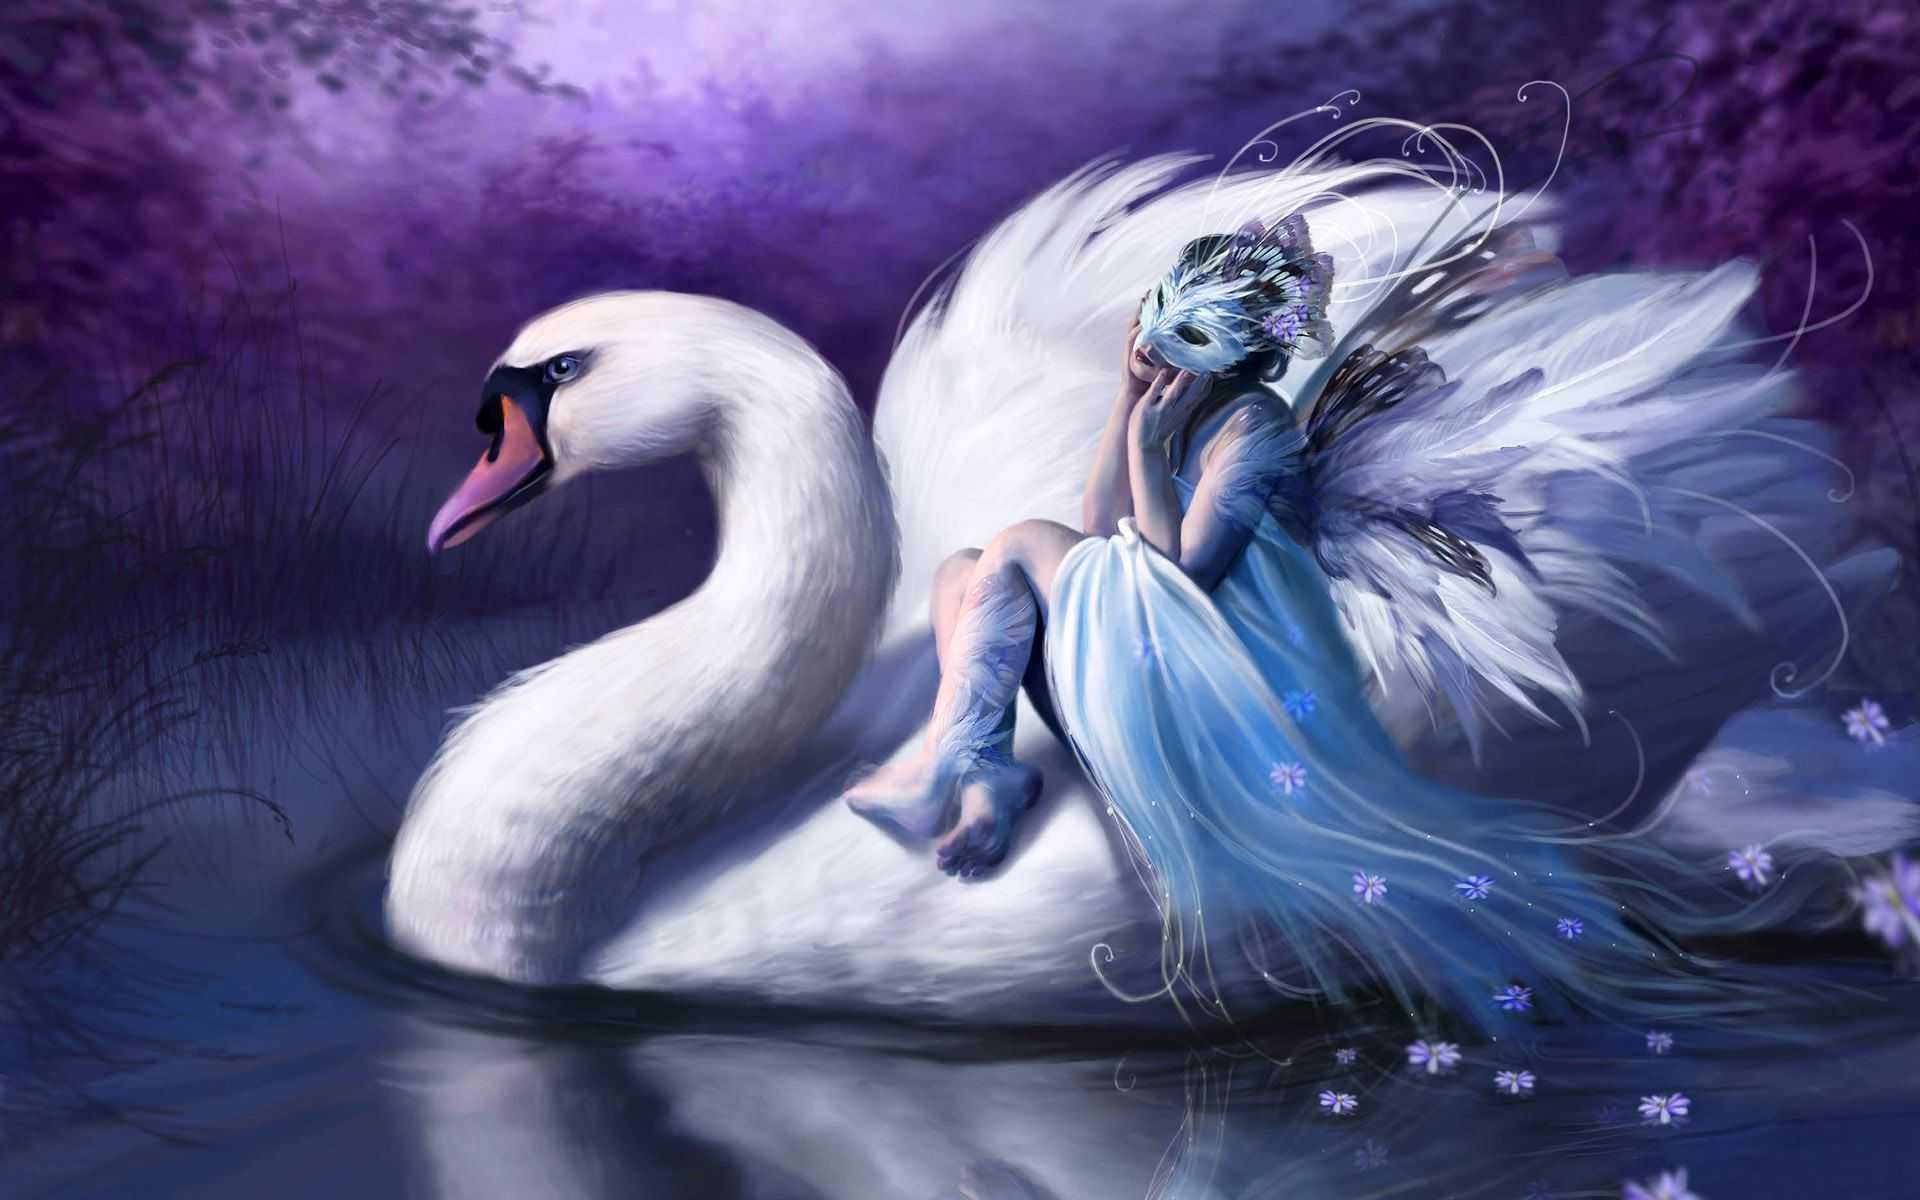 zwdia-kiknos-angel